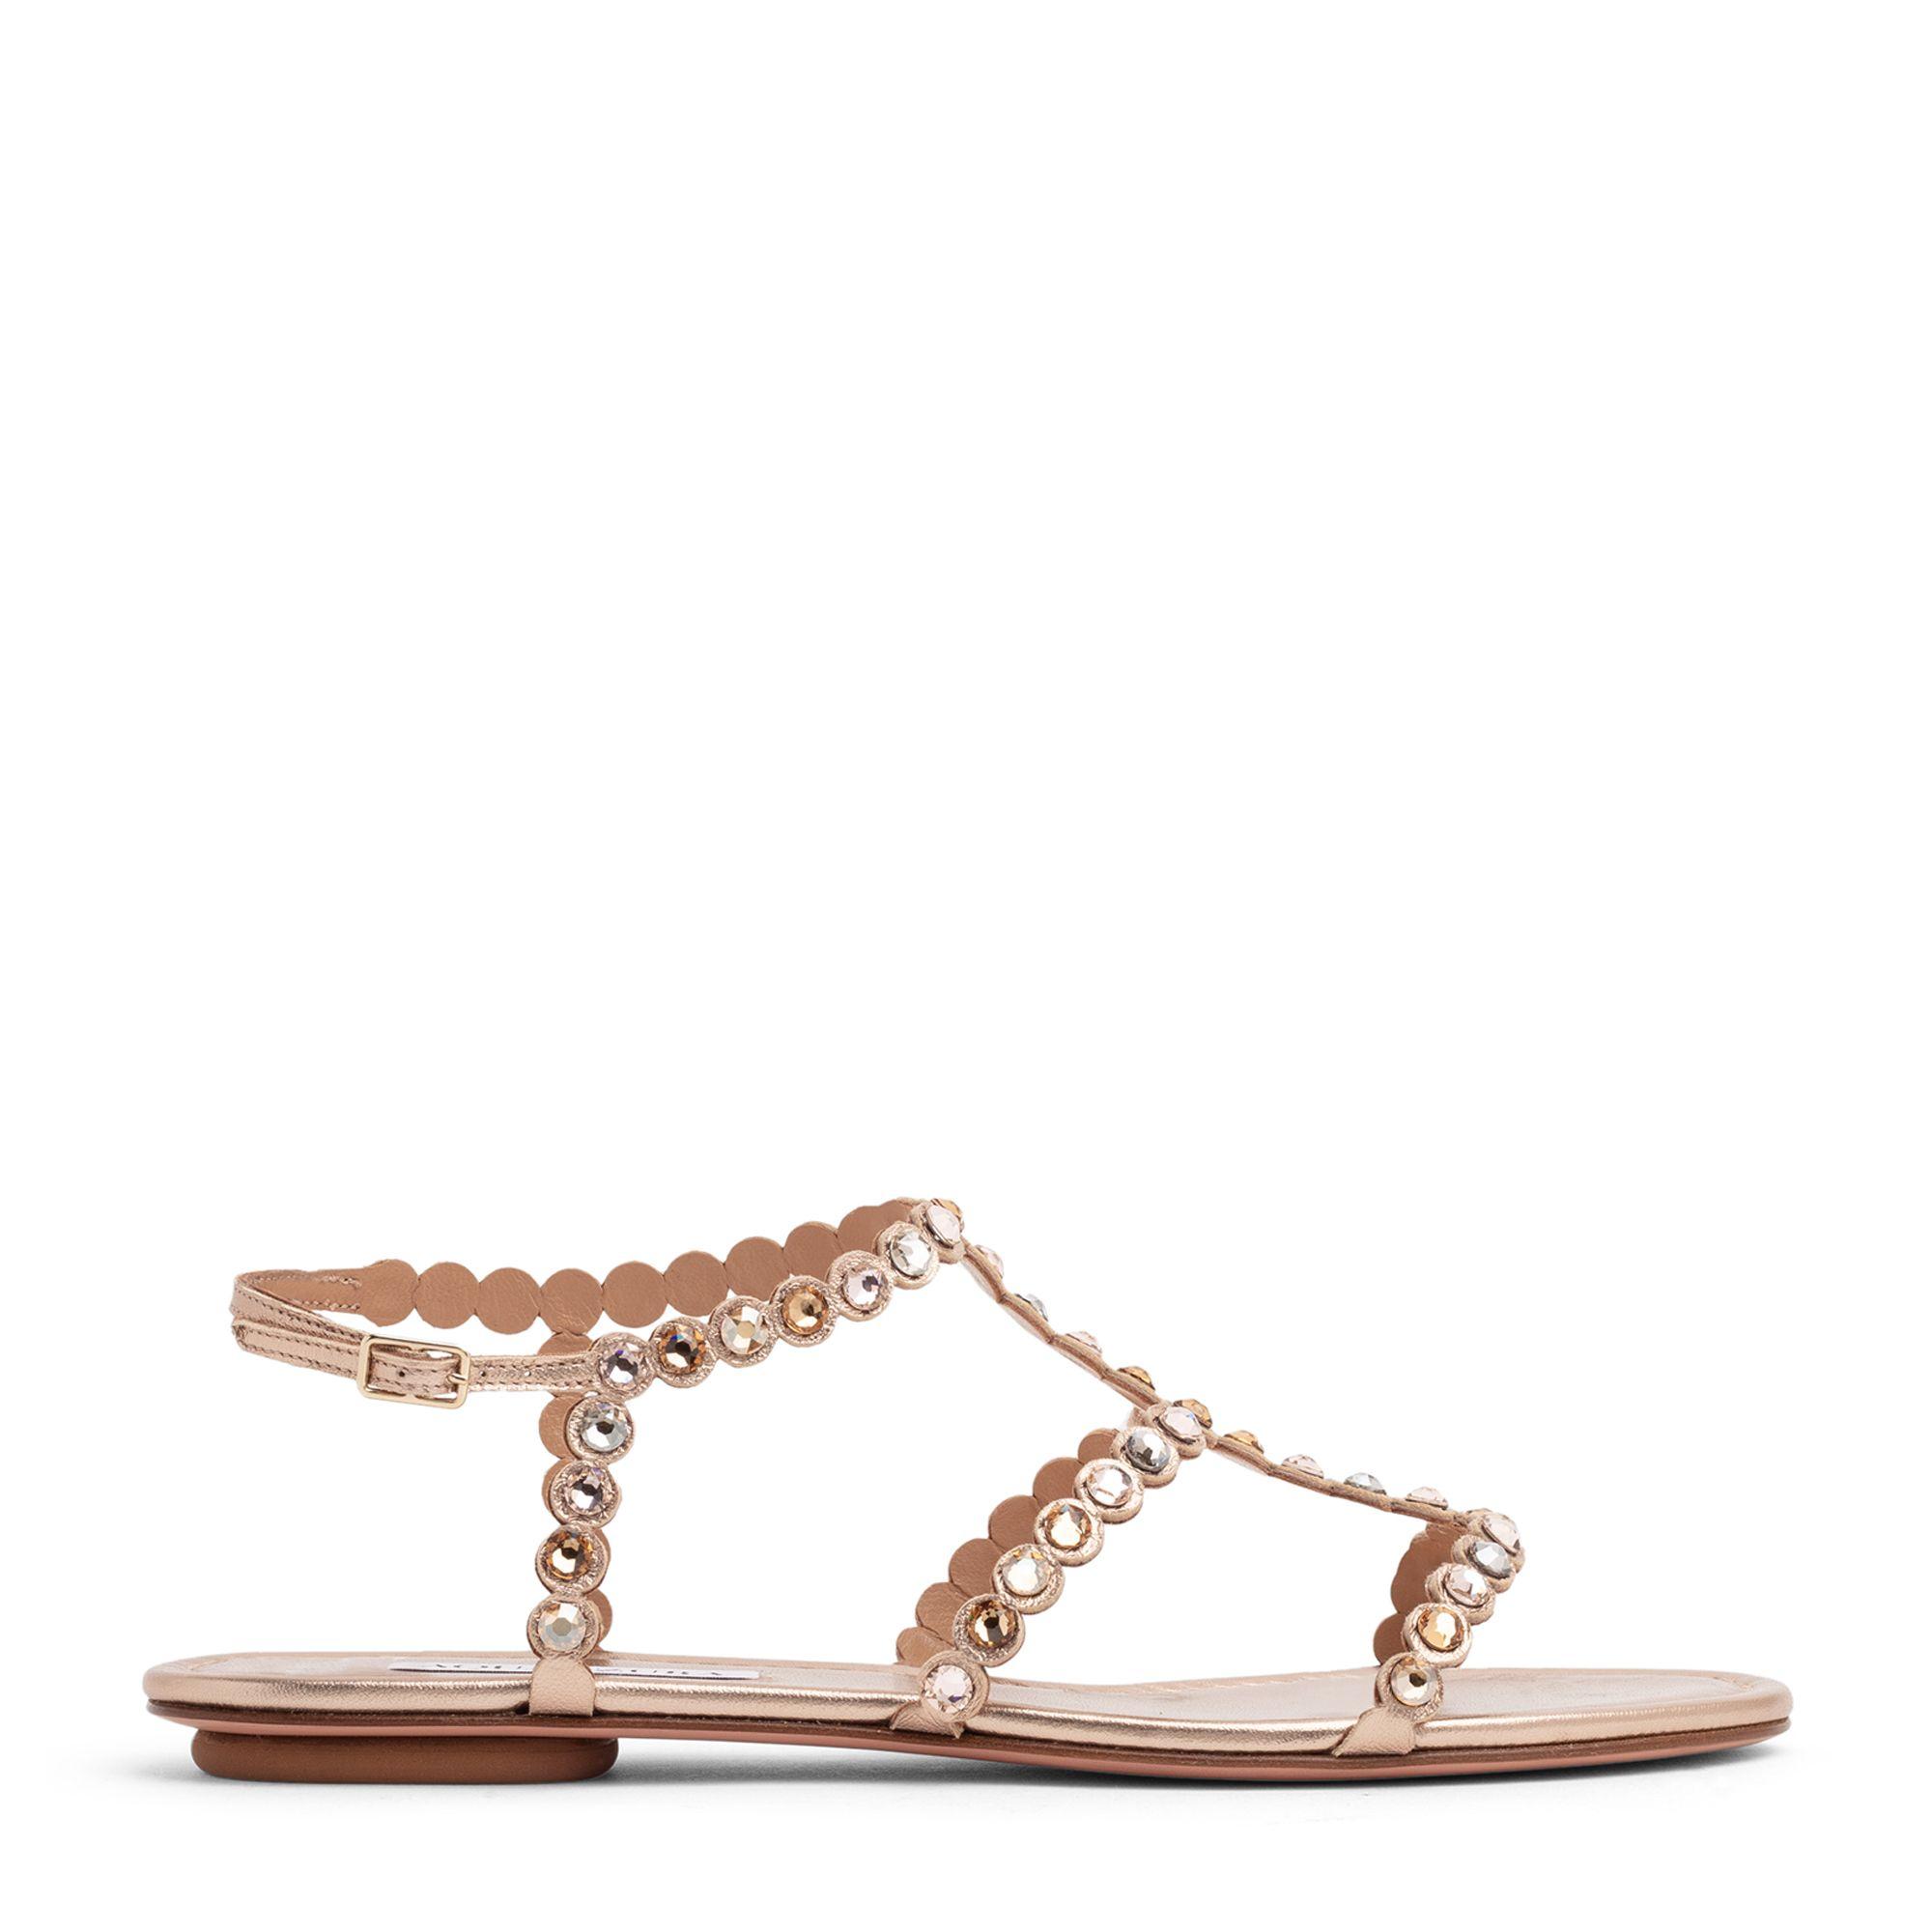 Tequila flat sandals